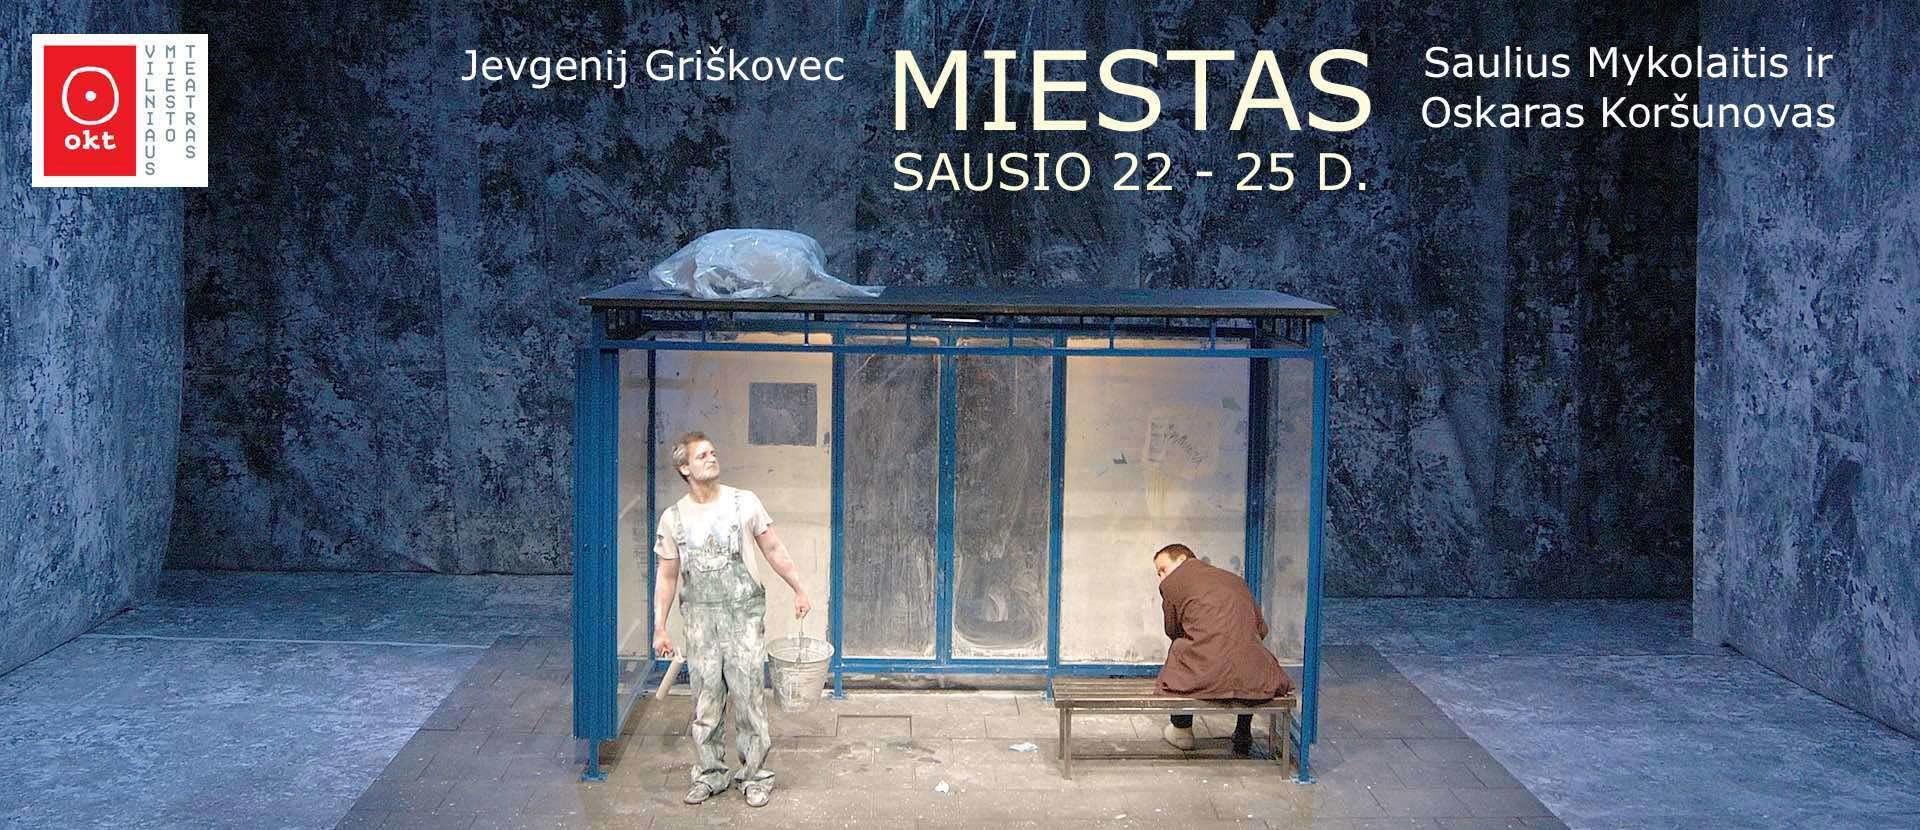 "ONLINE: OKT | Vilniaus miesto teatras:  ""Miestas""  (rež. Saulius Mykolaitis ir Oskaras Koršunovas)"